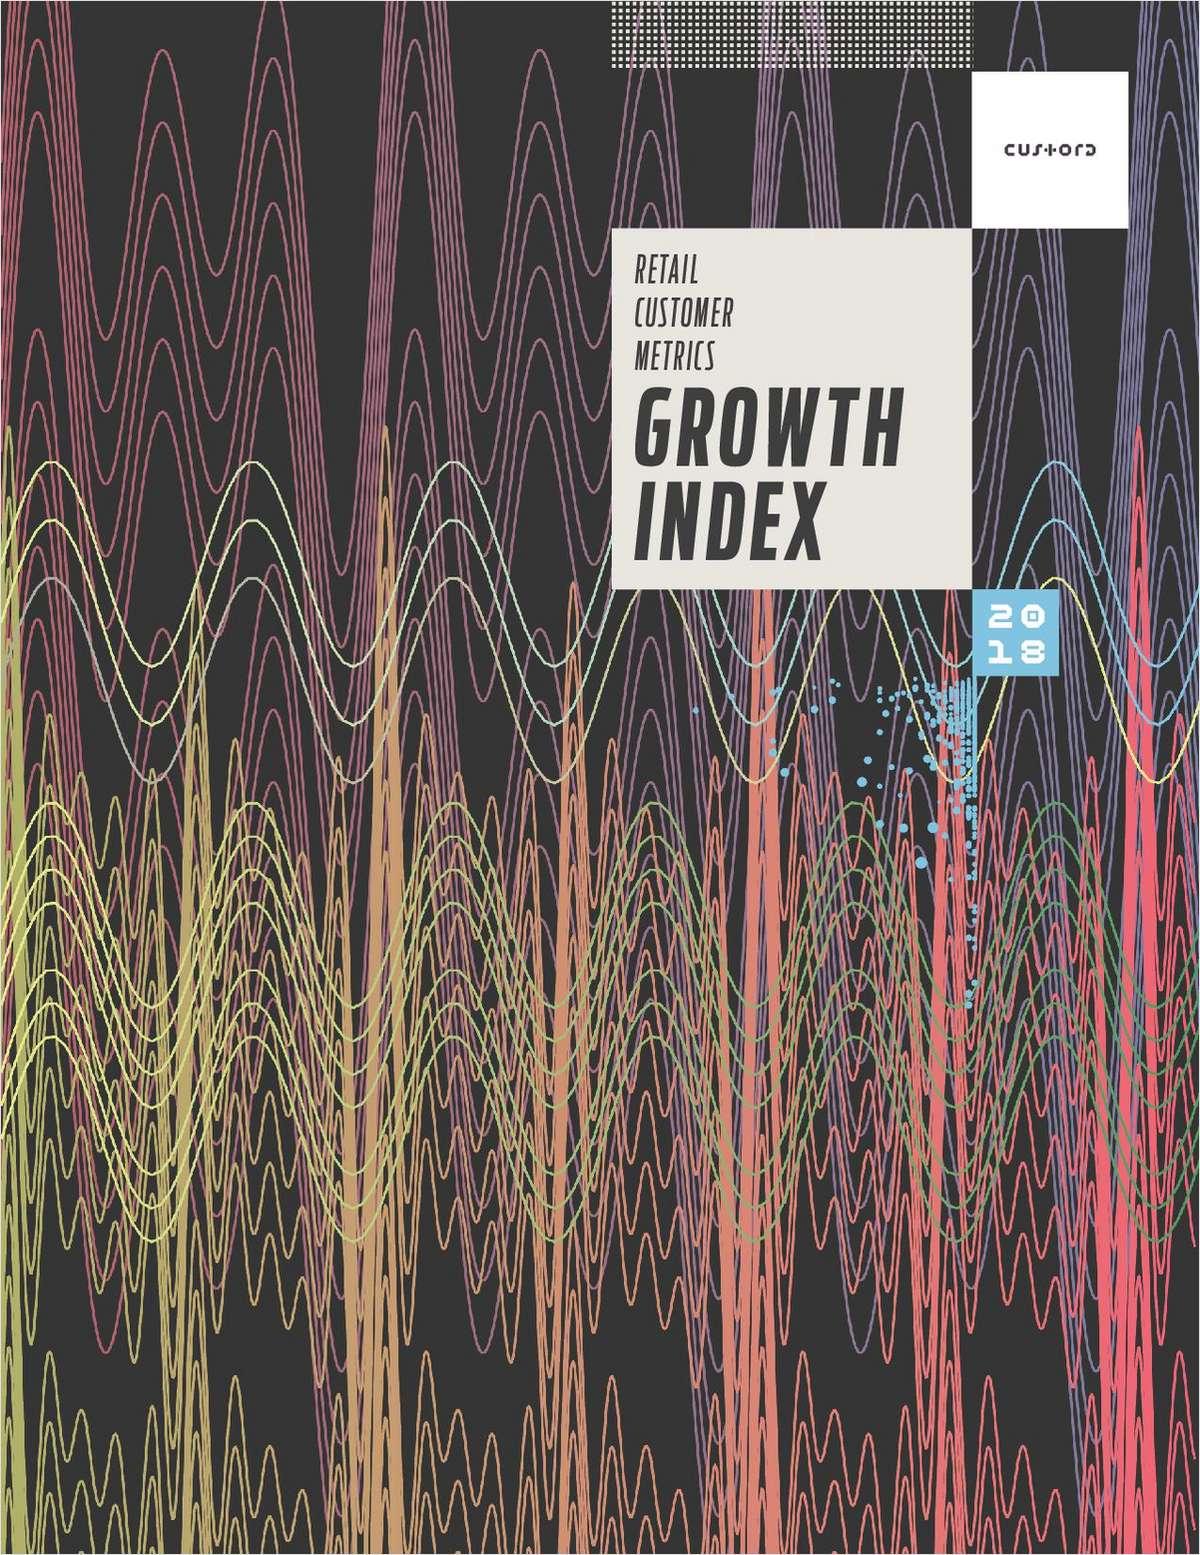 Retail Customer Metrics Growth Index